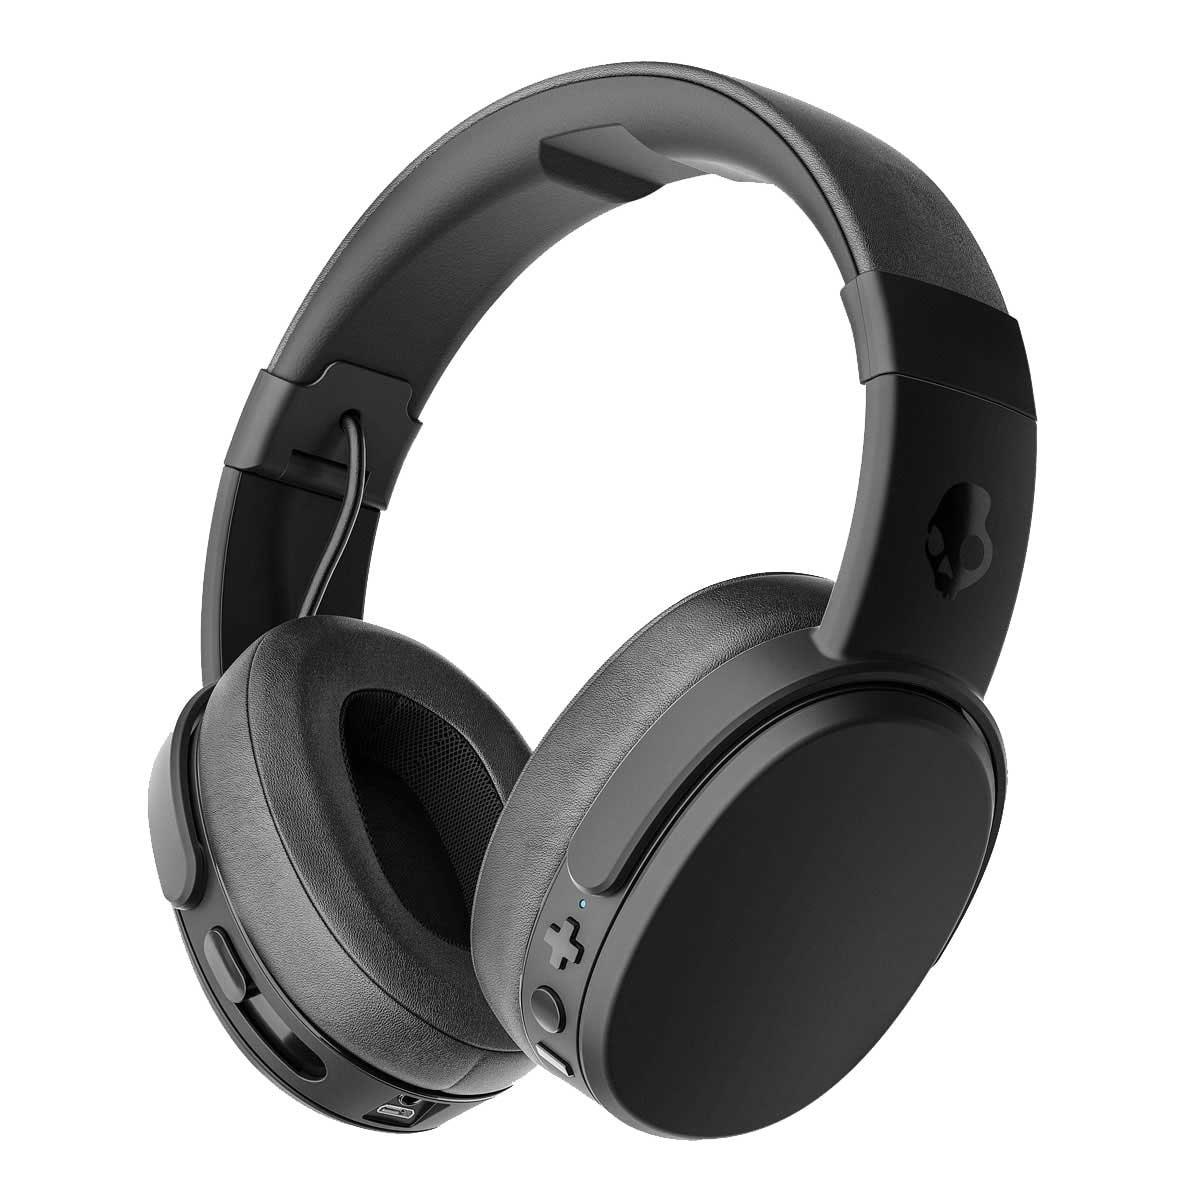 Audífonos Crusher Negro S6Crw-K591 Skullcandy